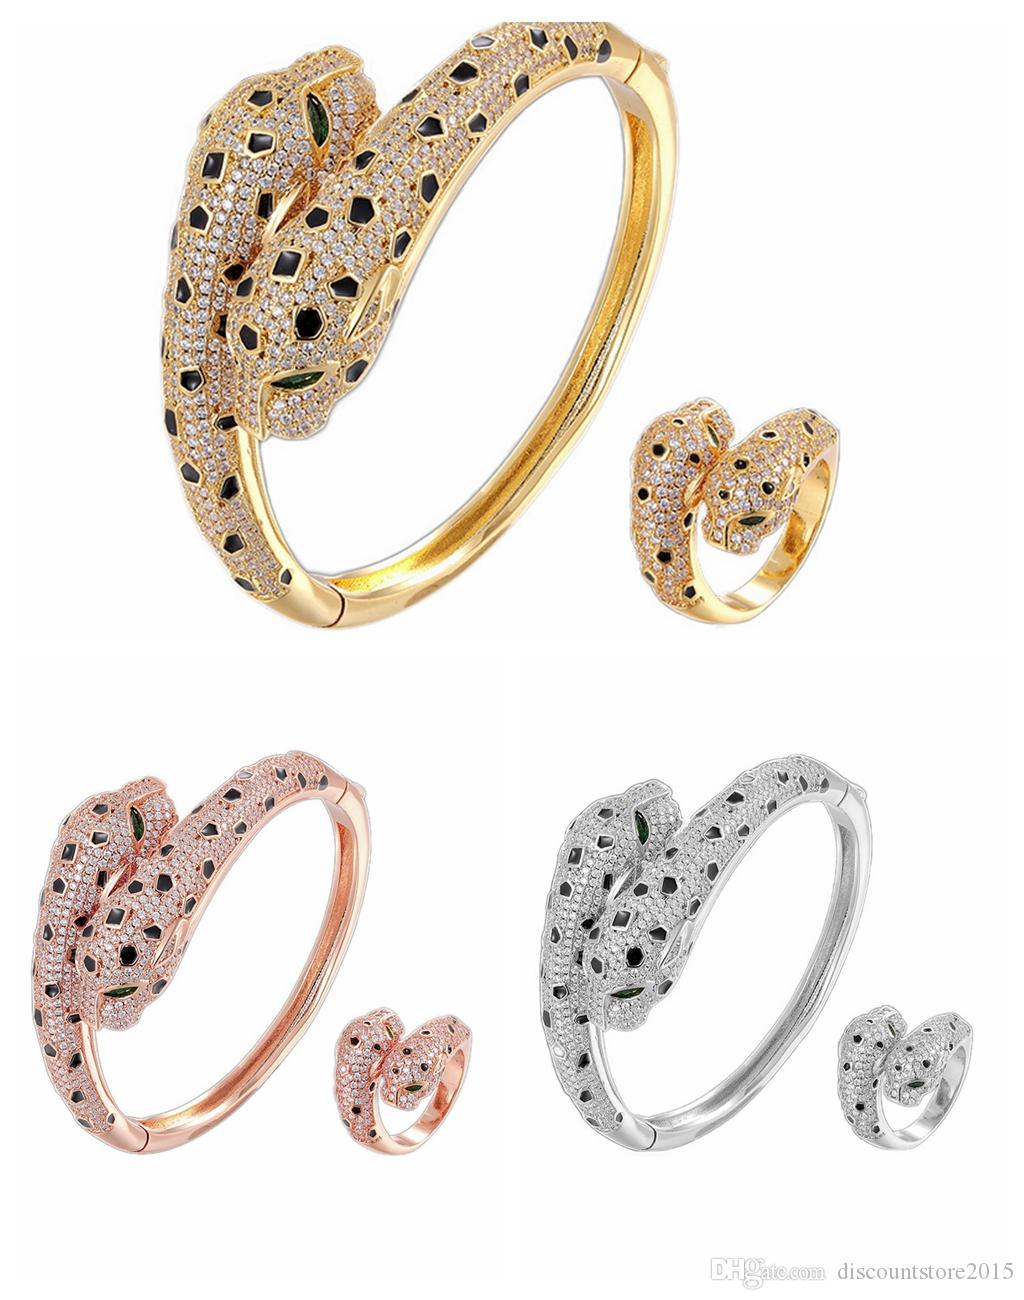 Marca de moda de jóias de luxo Lady Bronze Cheio de Diamantes Olhos Verdes Cabeças de Leopardo Duplas 18 K Ouro de Noivado Pantera Aberta Pulseiras Anel 3 Cores